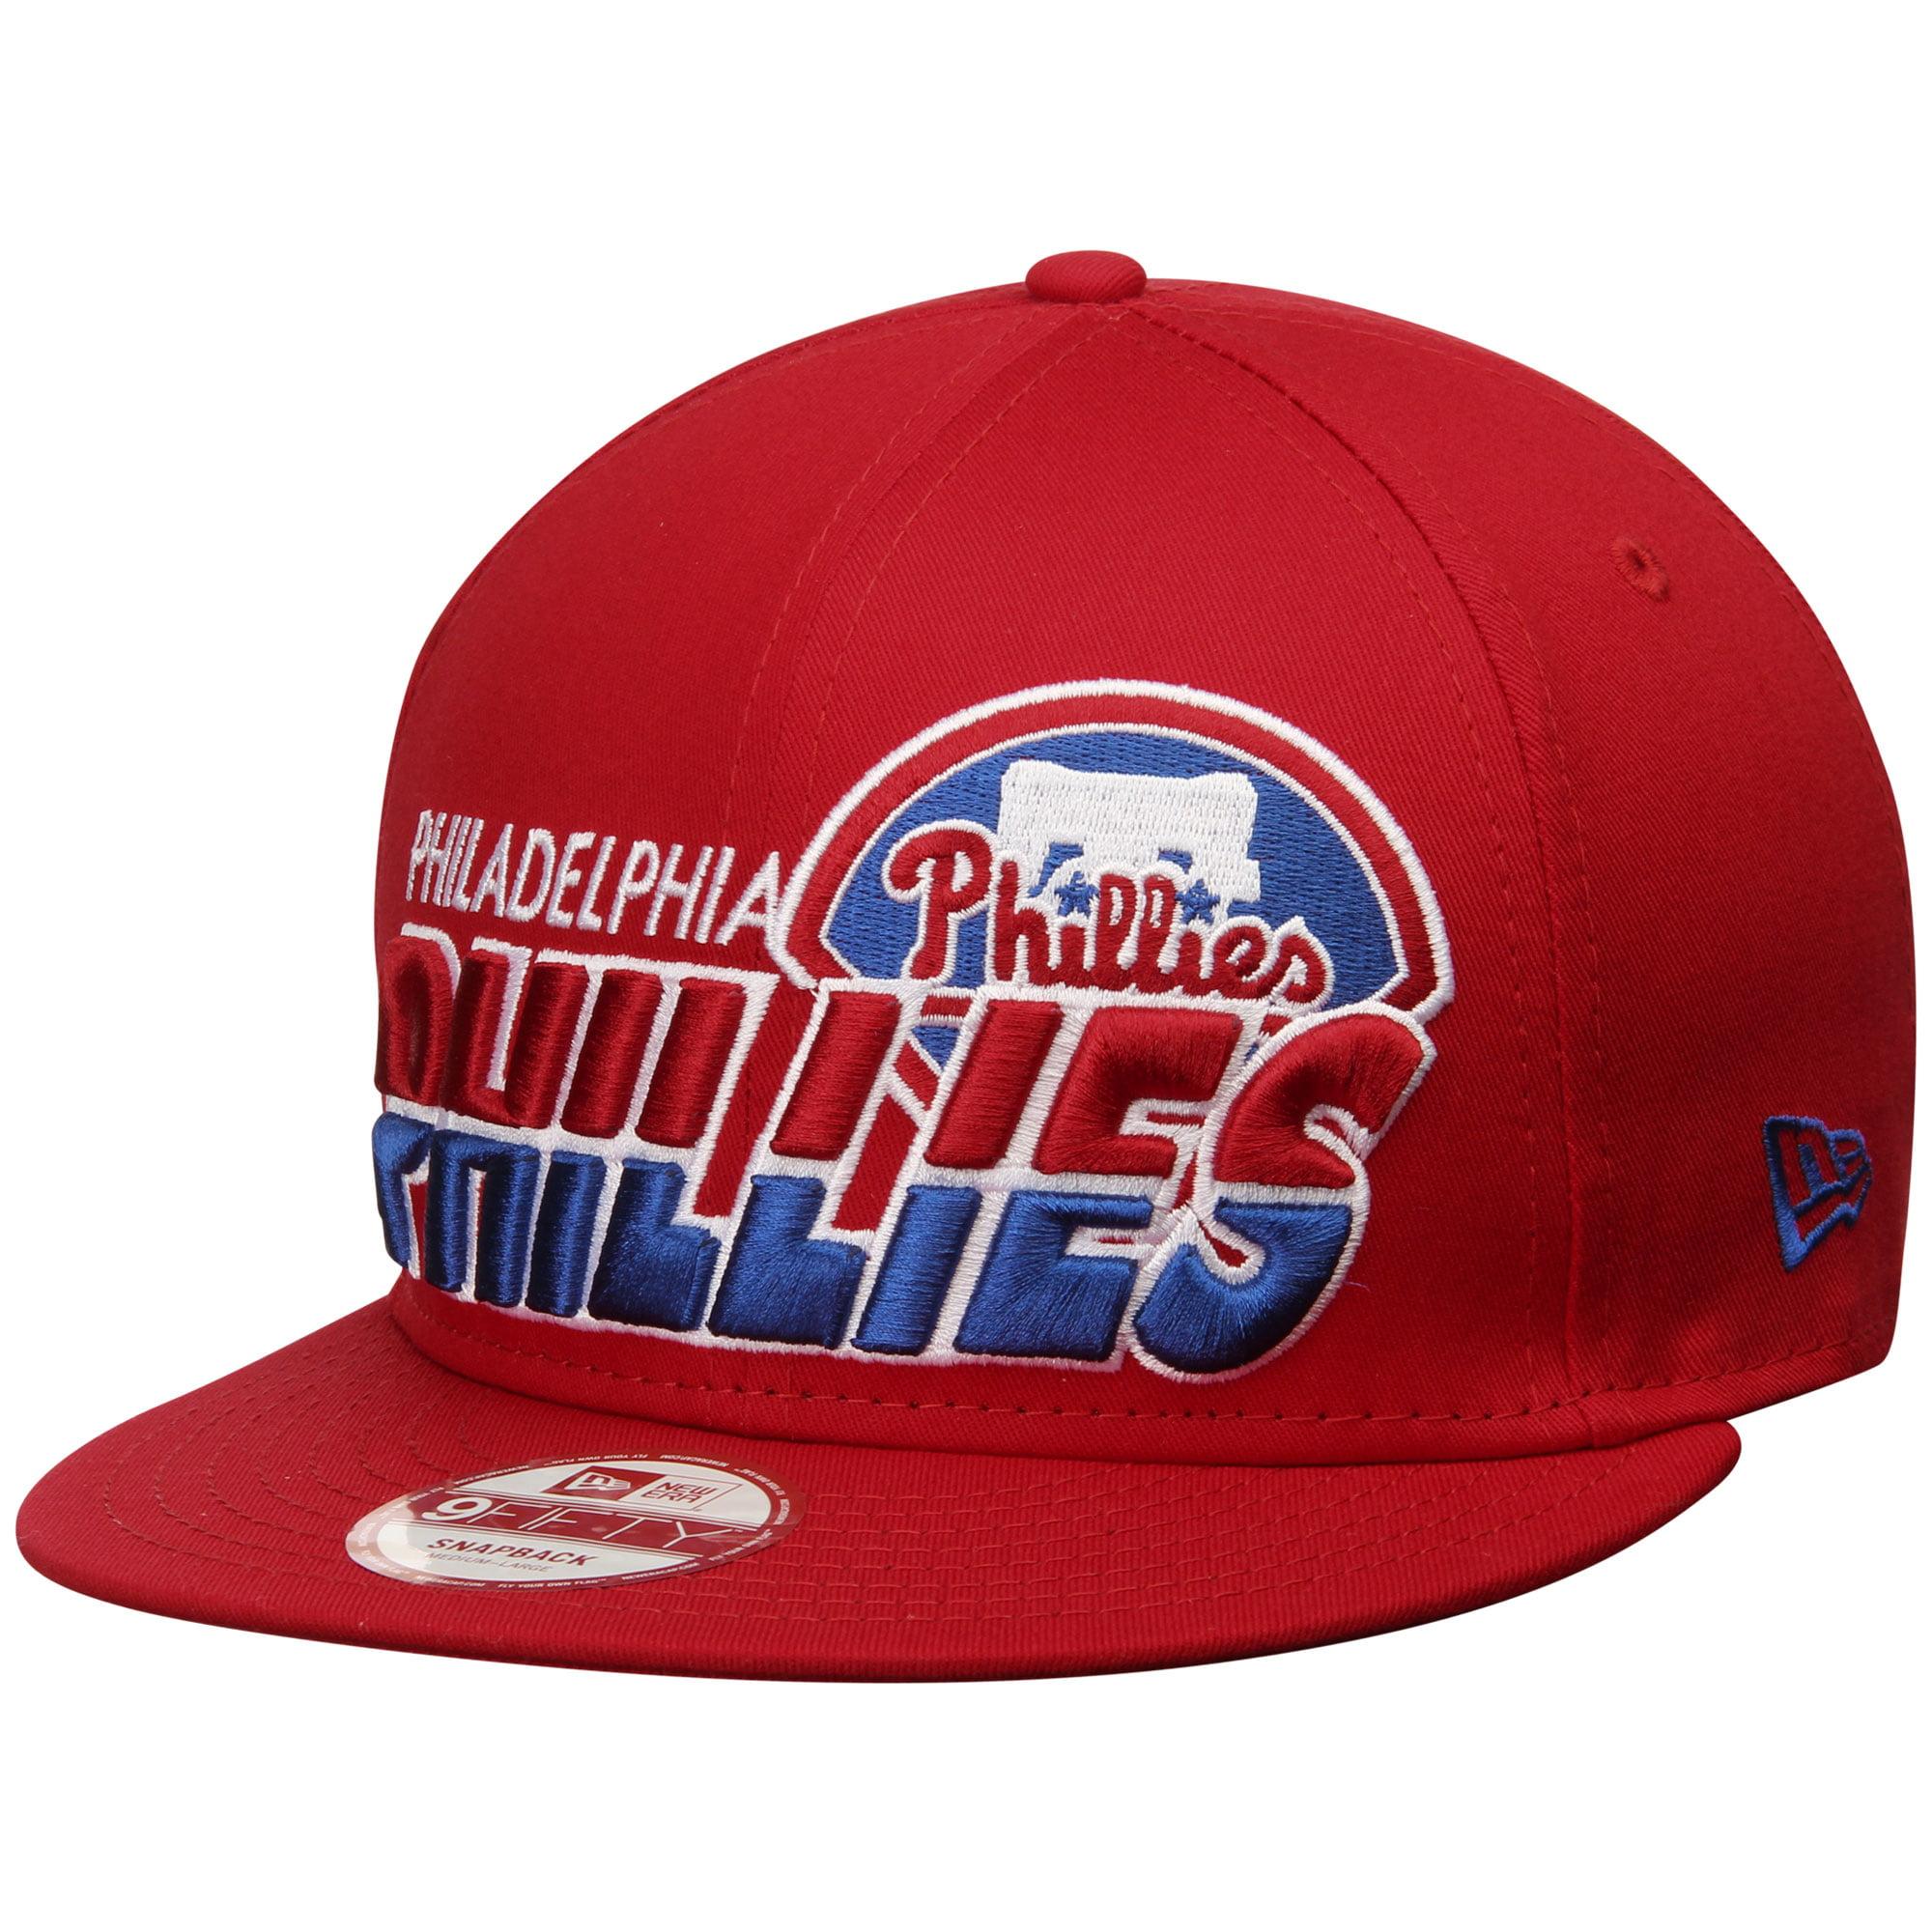 sale retailer c052e 51a86 ... france product image philadelphia phillies new era team horizon 9fifty  snapback adjustable hat red osfa a7665